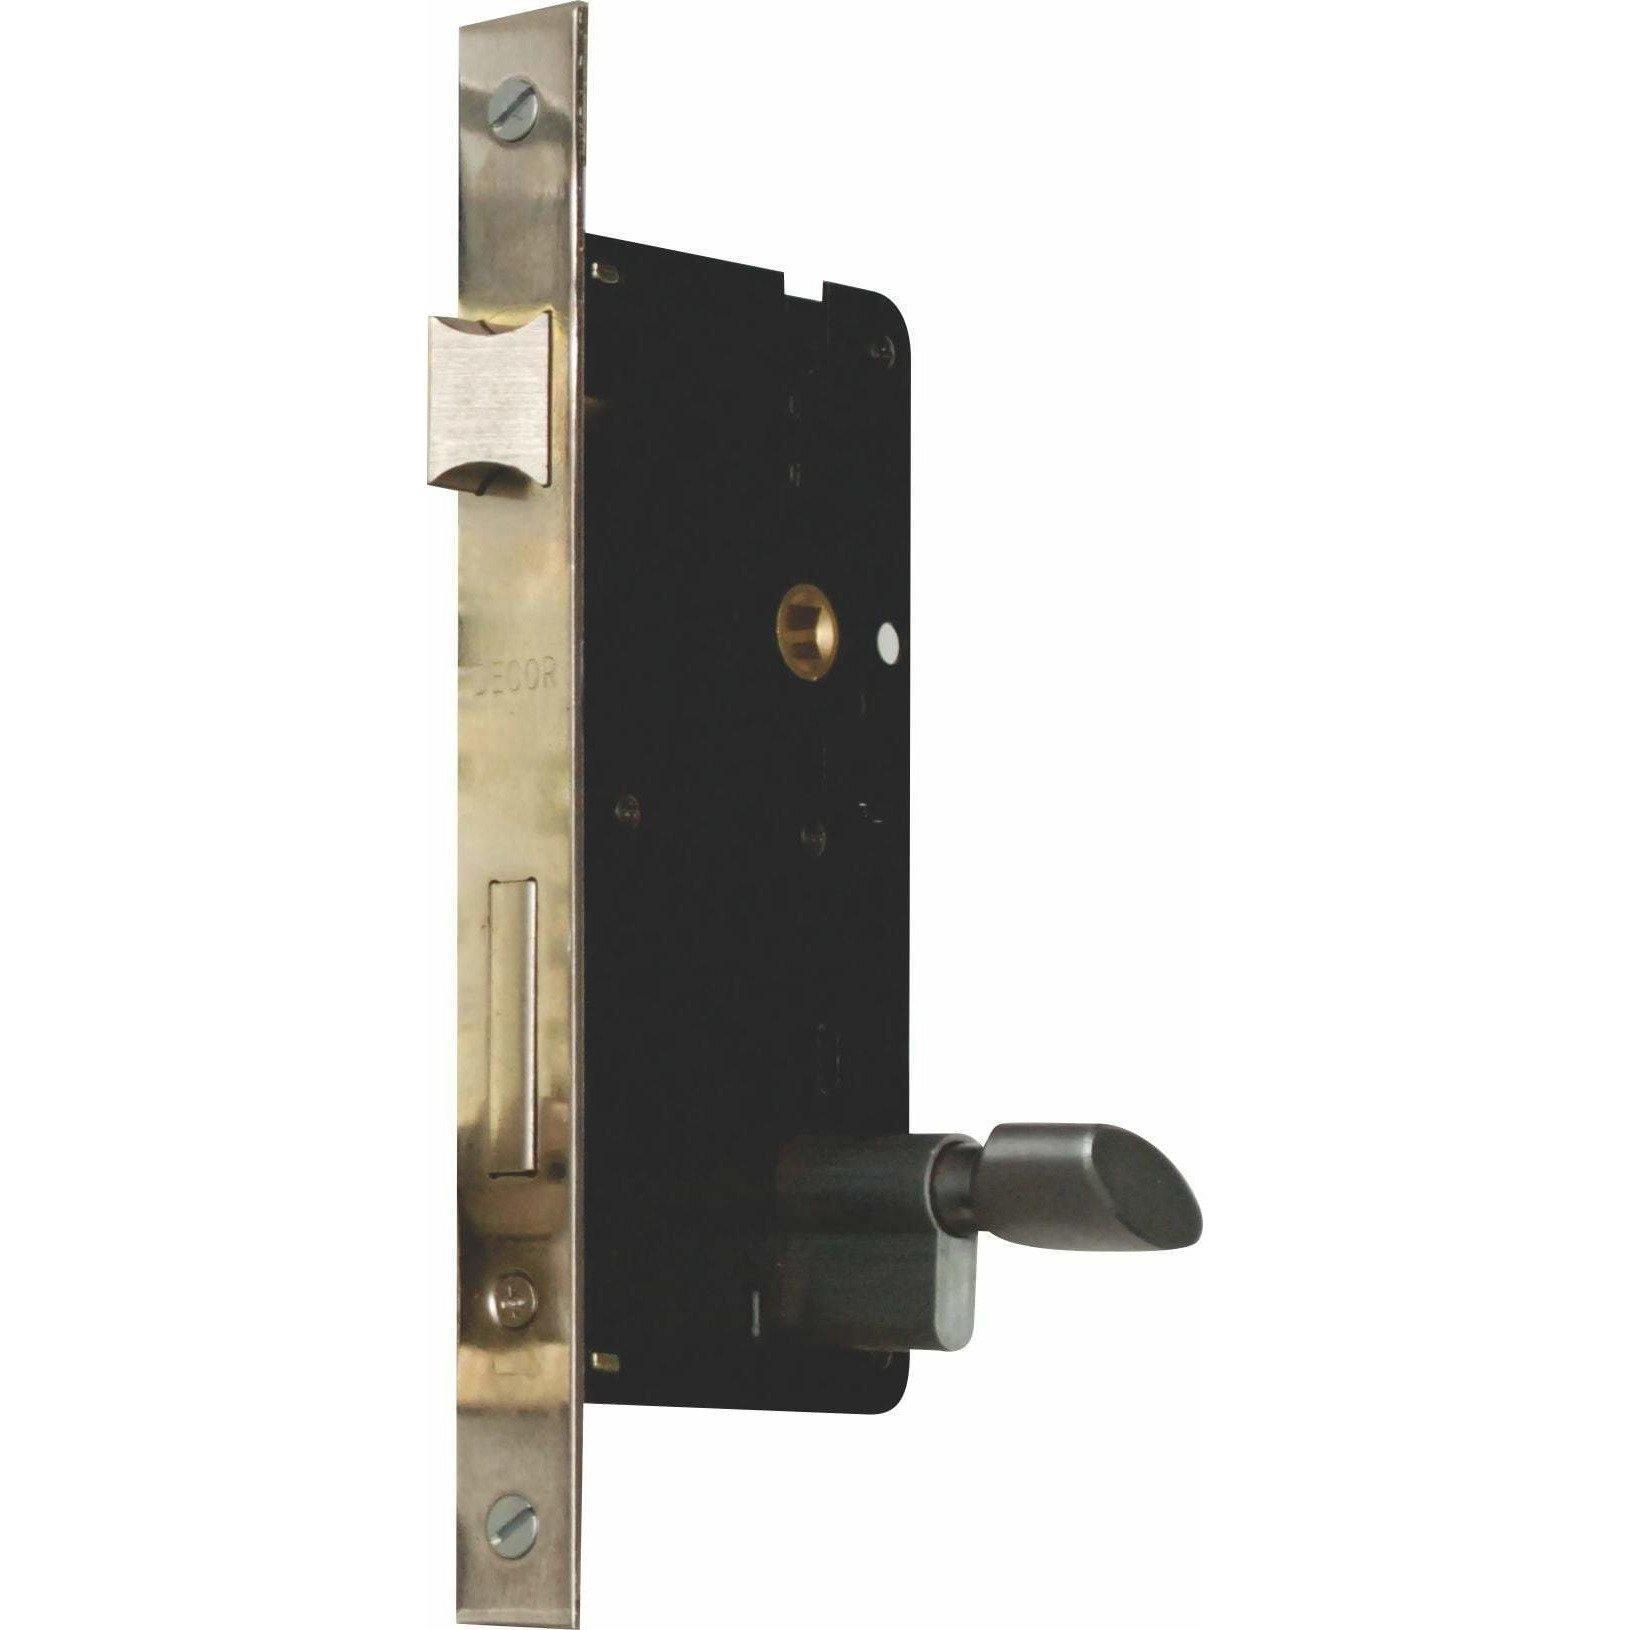 Door Lock - Latch - 60mm Backset - Double Locking (Lock Body Only)